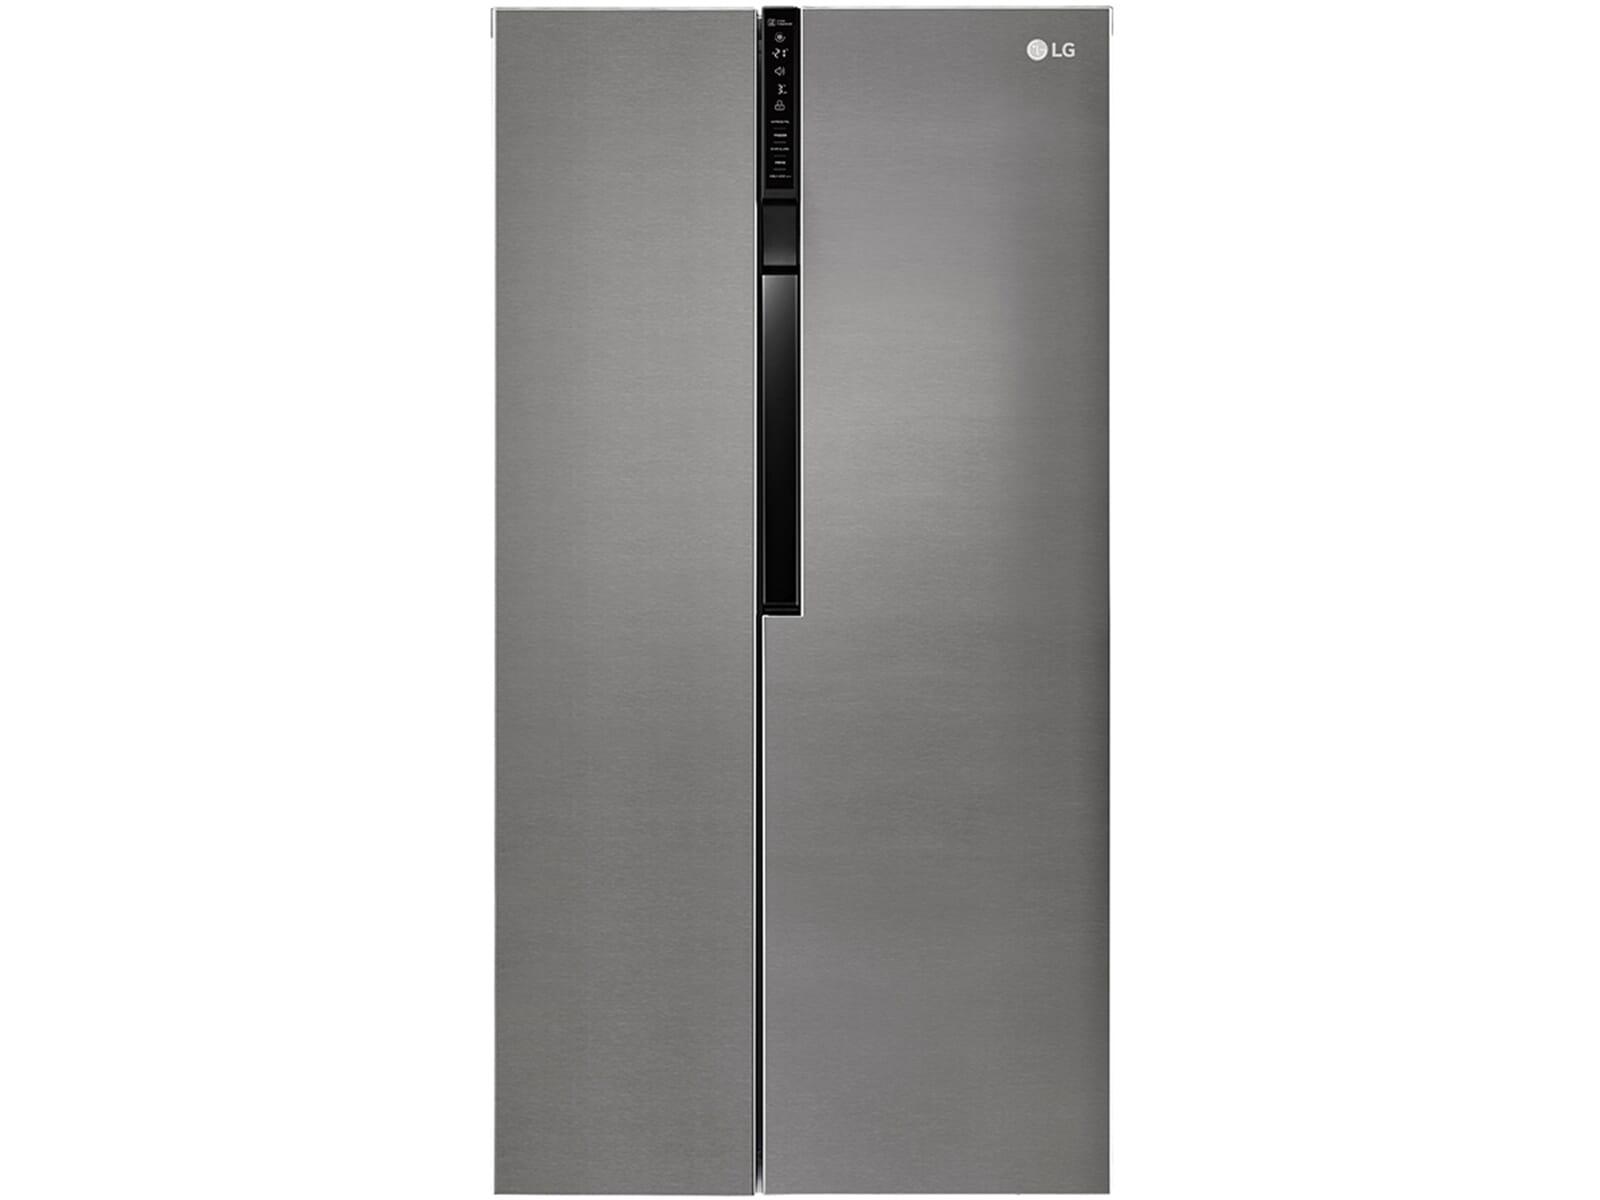 Side By Side Kühlschrank 10 Jahre Garantie : Lg gsb basz side by side kühl gefrier kombination steel